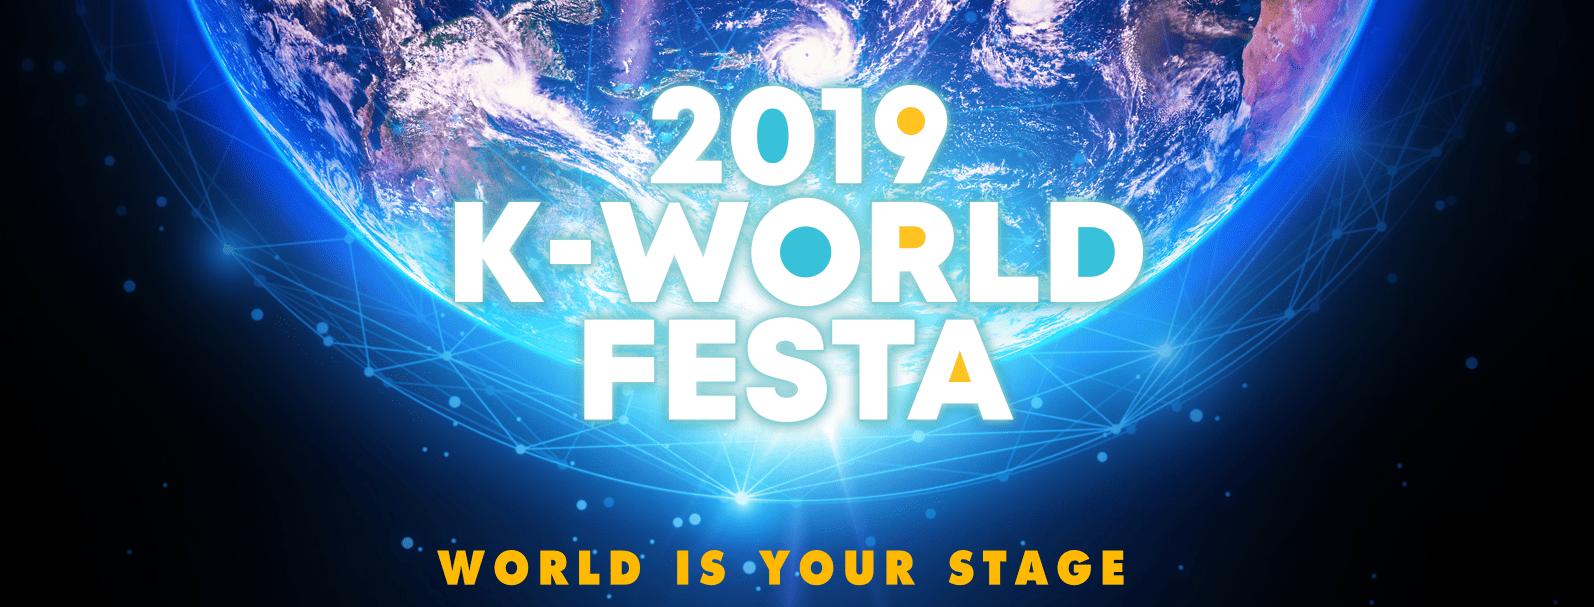 2019 K-World Festa Opening/Closing Ceremony Standing Ticket + Hanbok Experience (Aug 15/16/24)